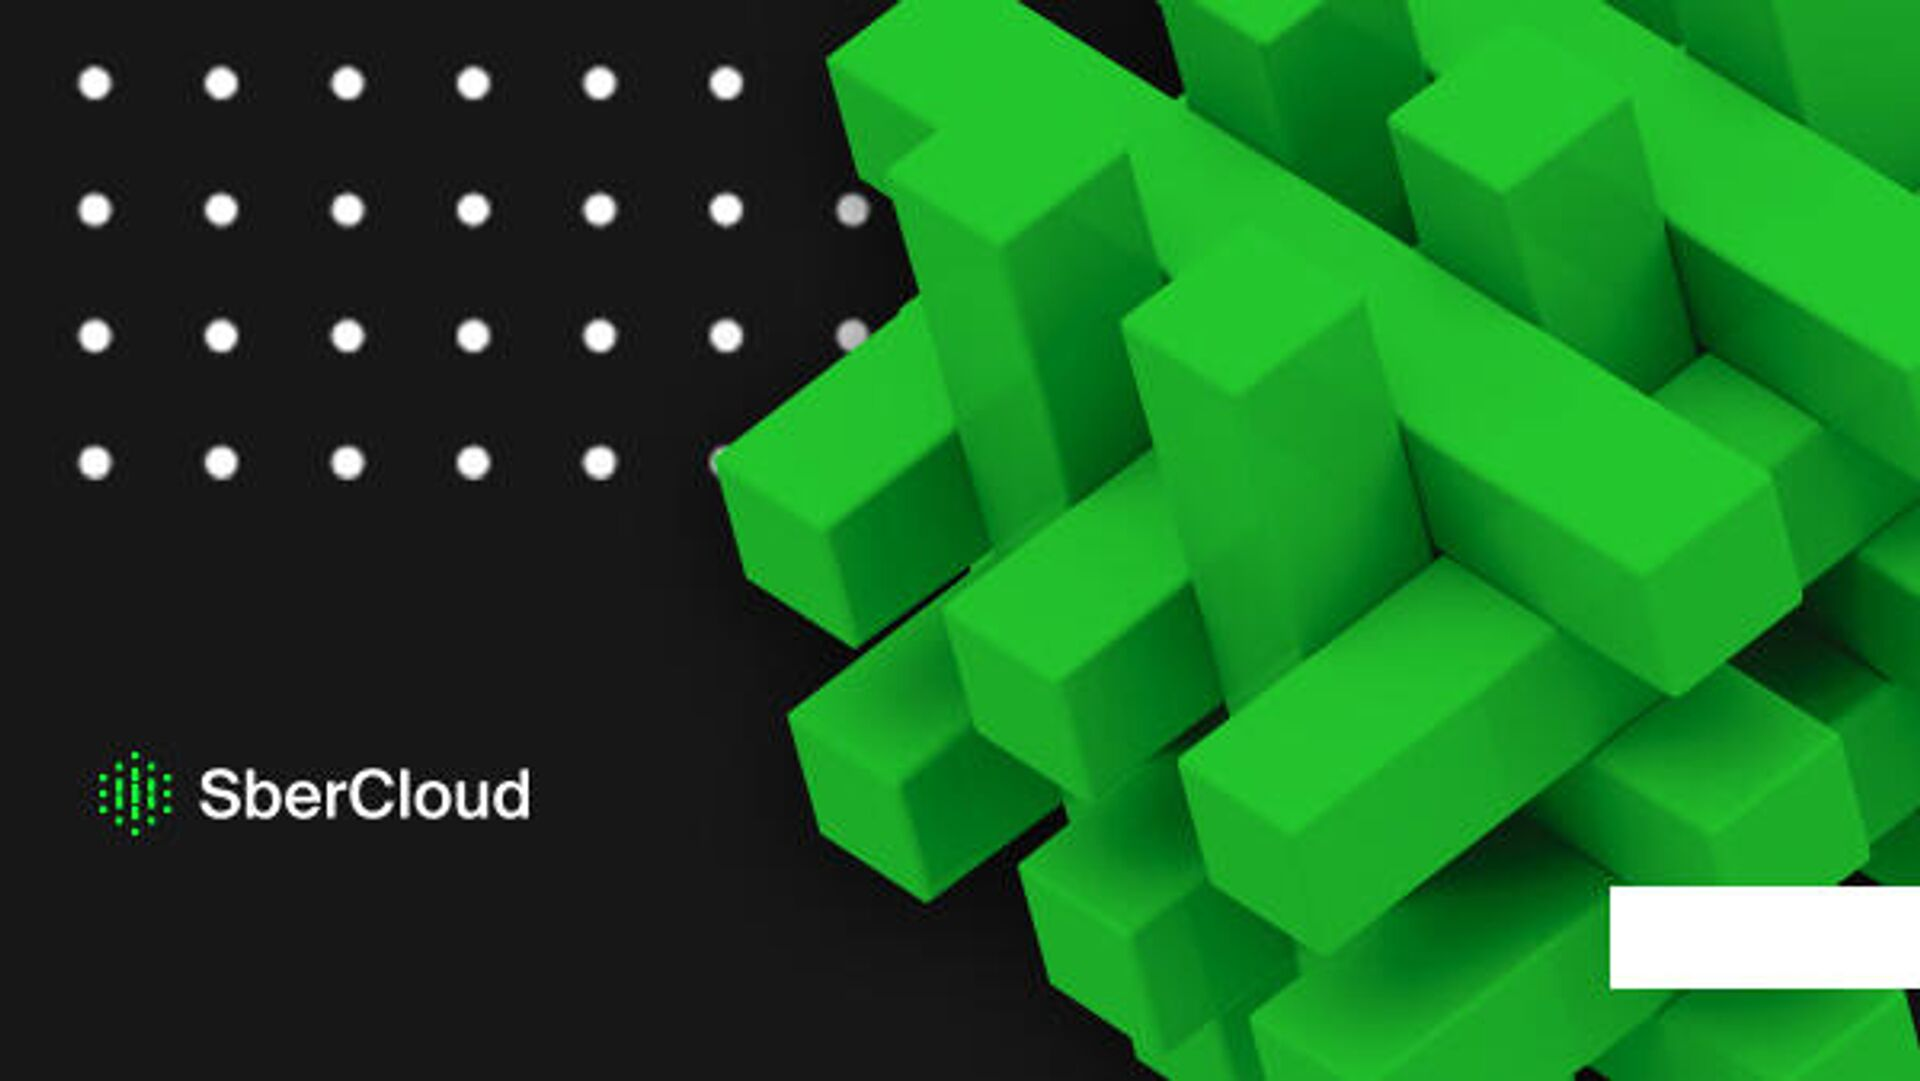 1574173340 0:0:600:338 1920x0 80 0 0 4df3433345a58951f0d7330cf58da280 - SberCloud представила новые облачные сервисы для стартапов и МСП